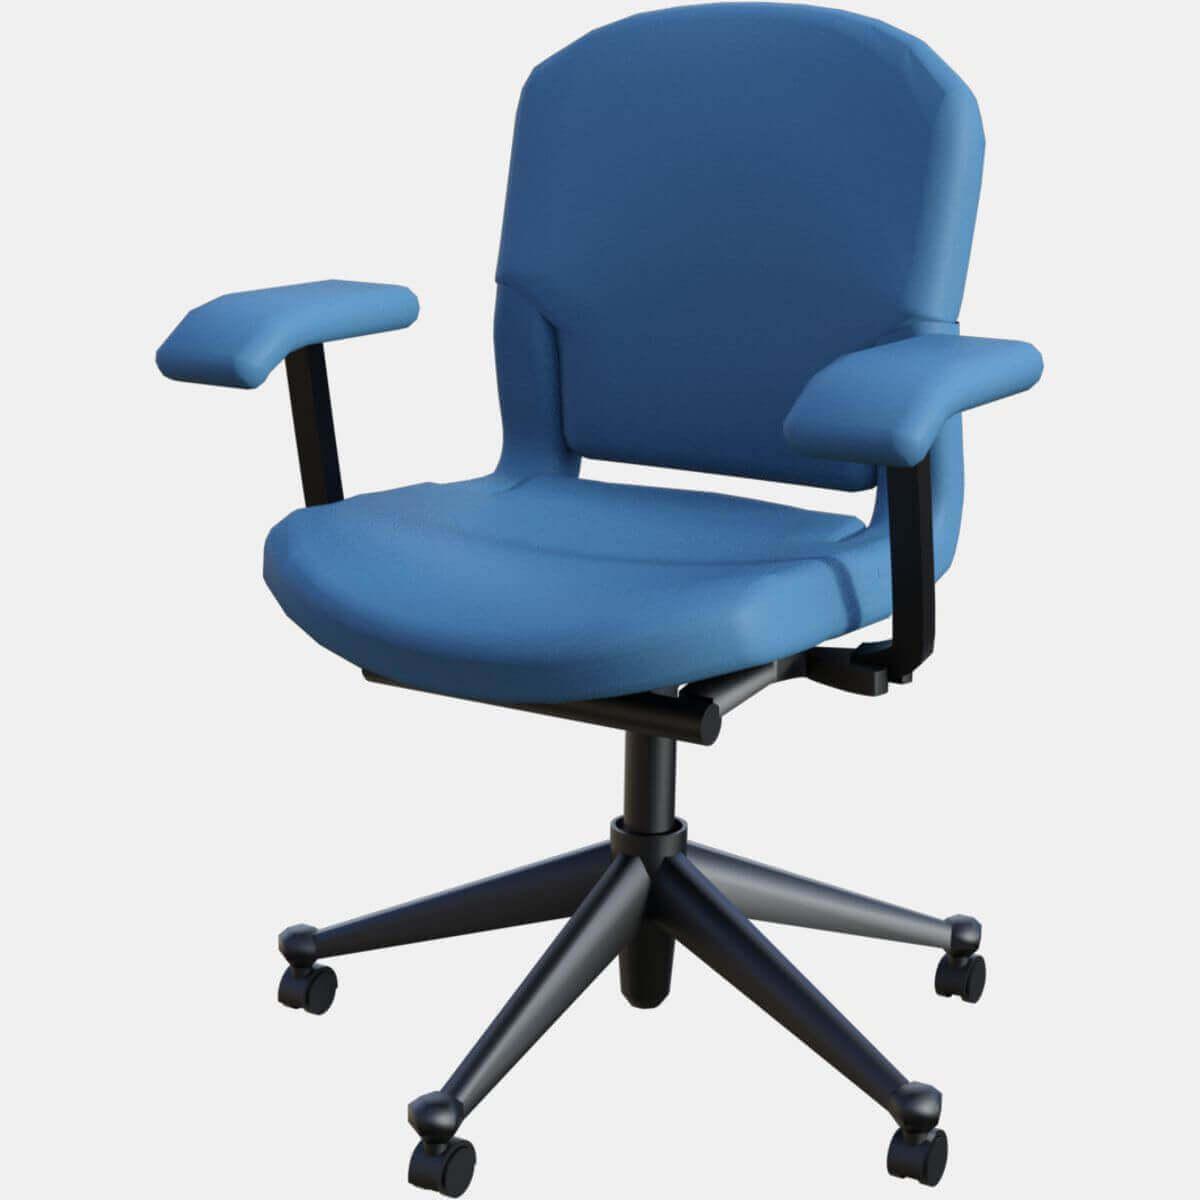 super popular f9aec 63053 Herman Miller Equa 2 Work Chair Free 3D Model